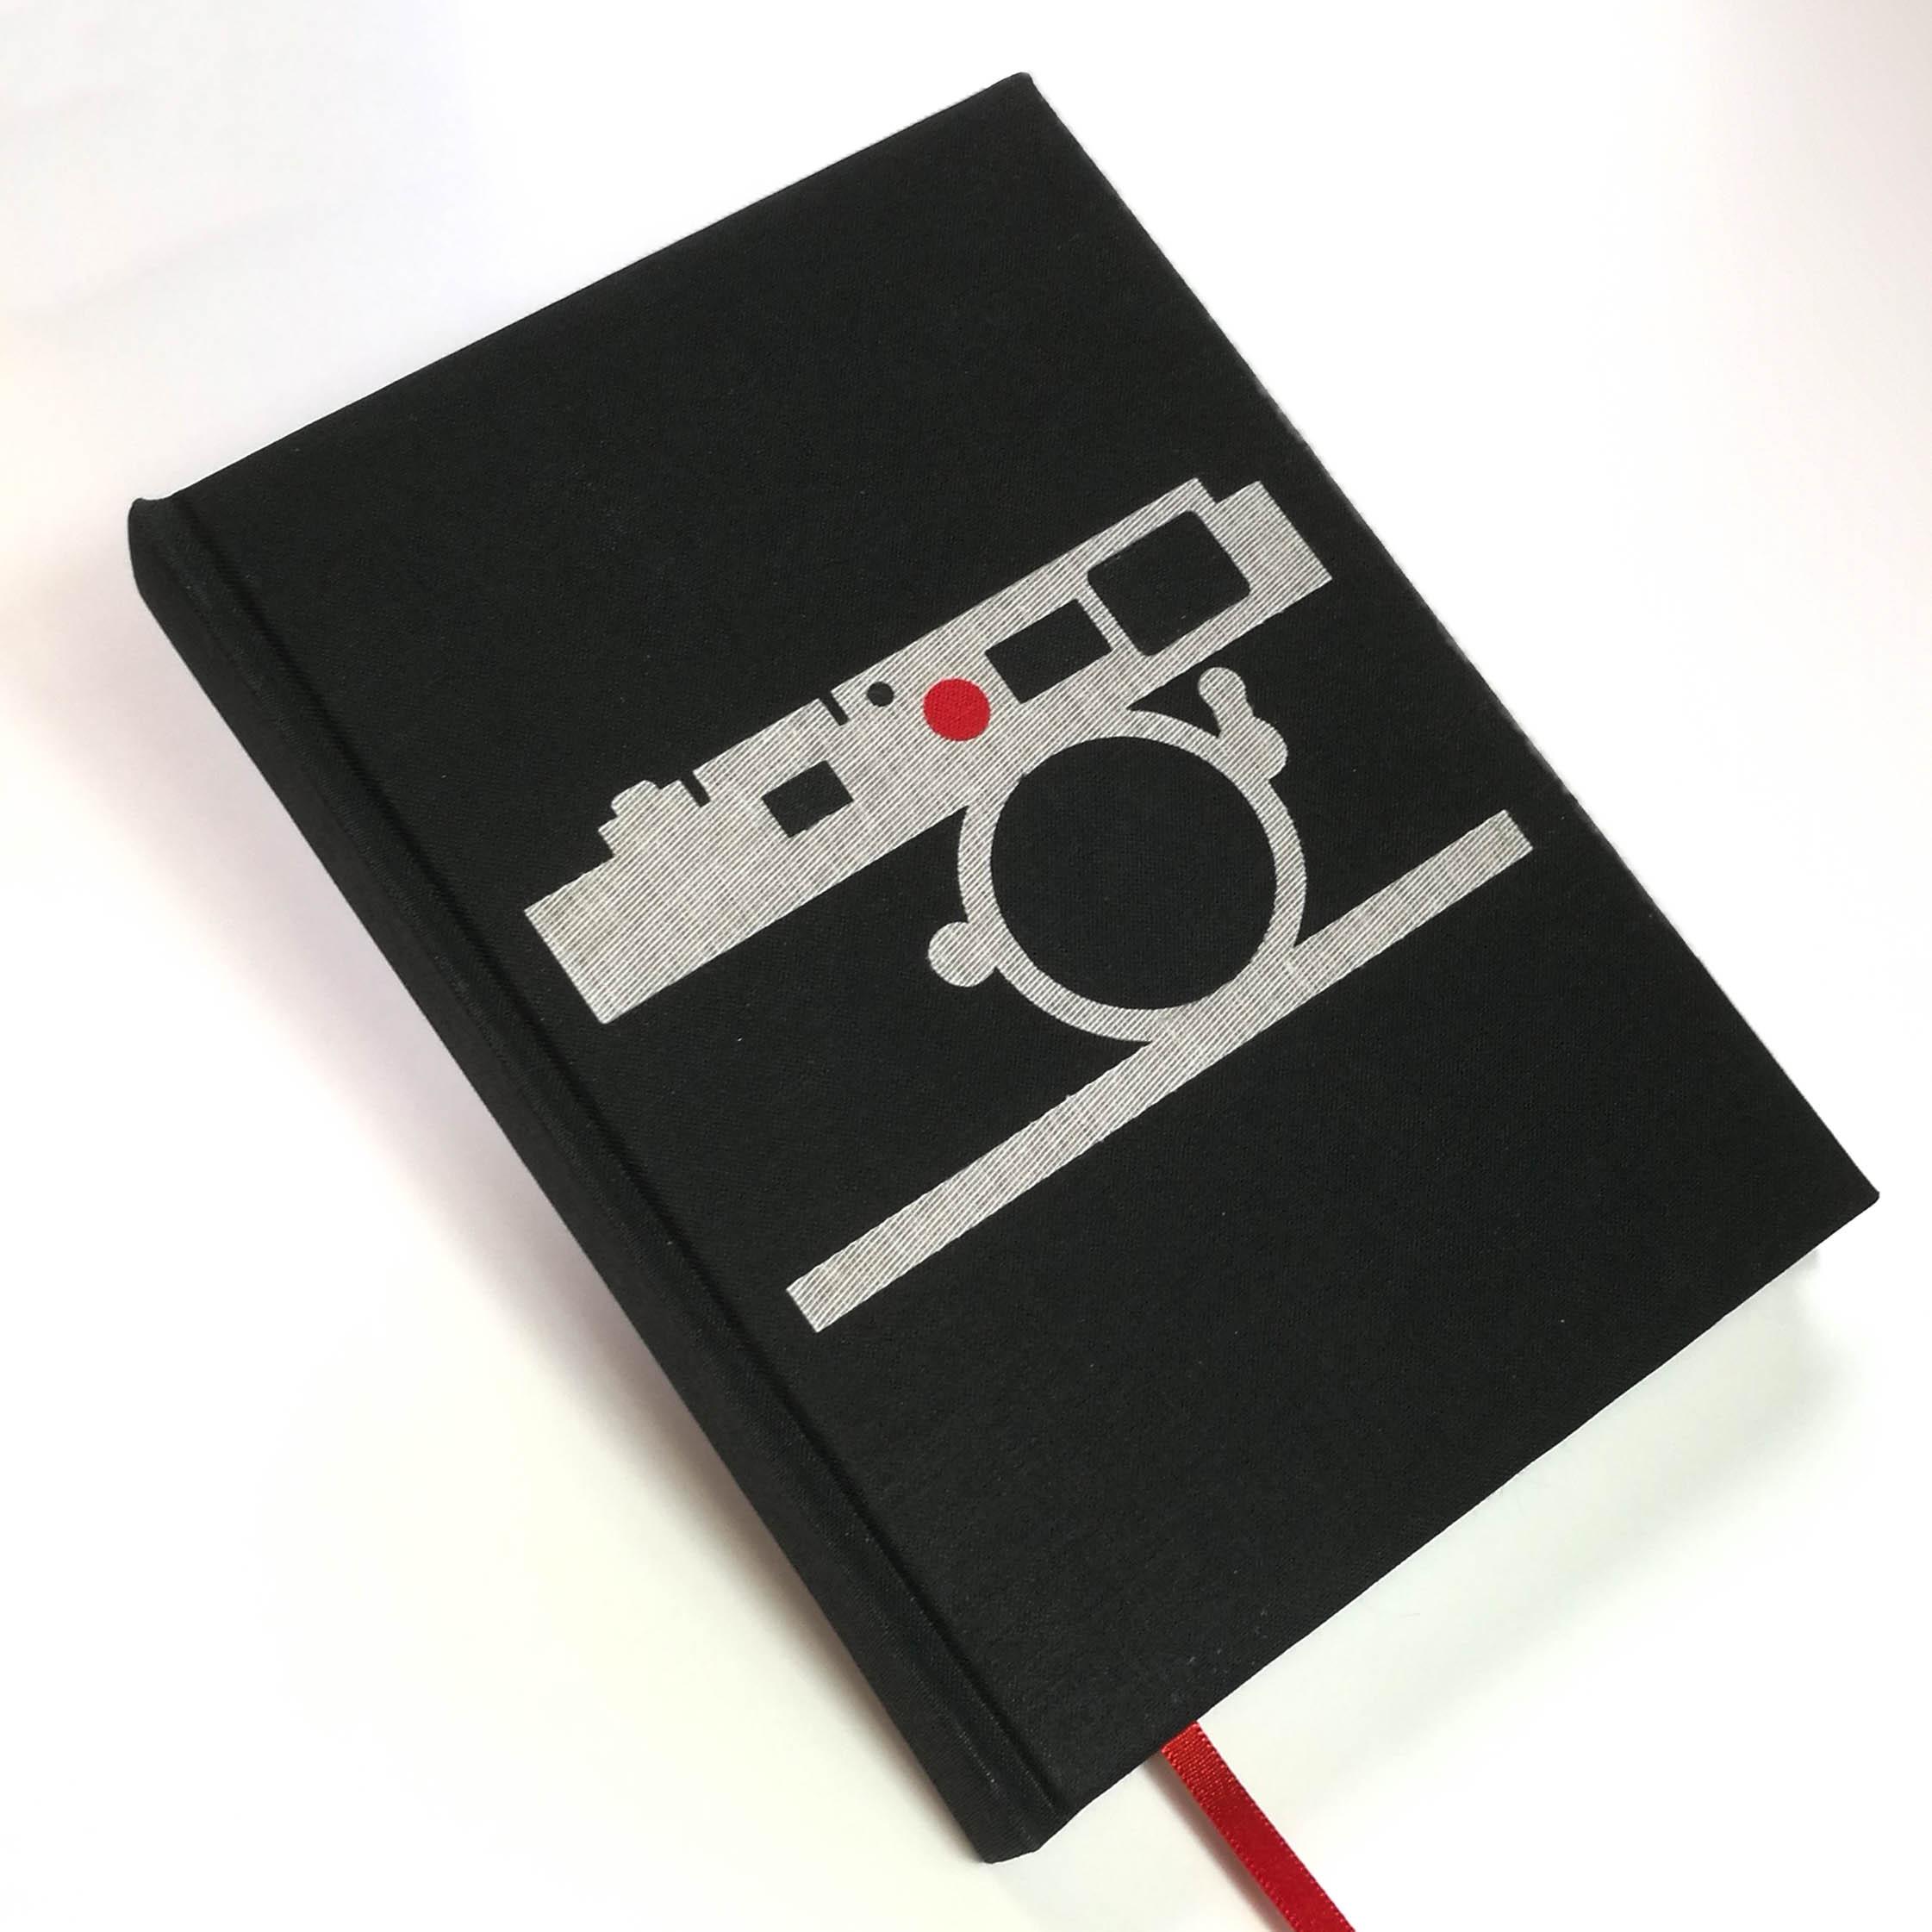 Eberlin Leica front.jpg